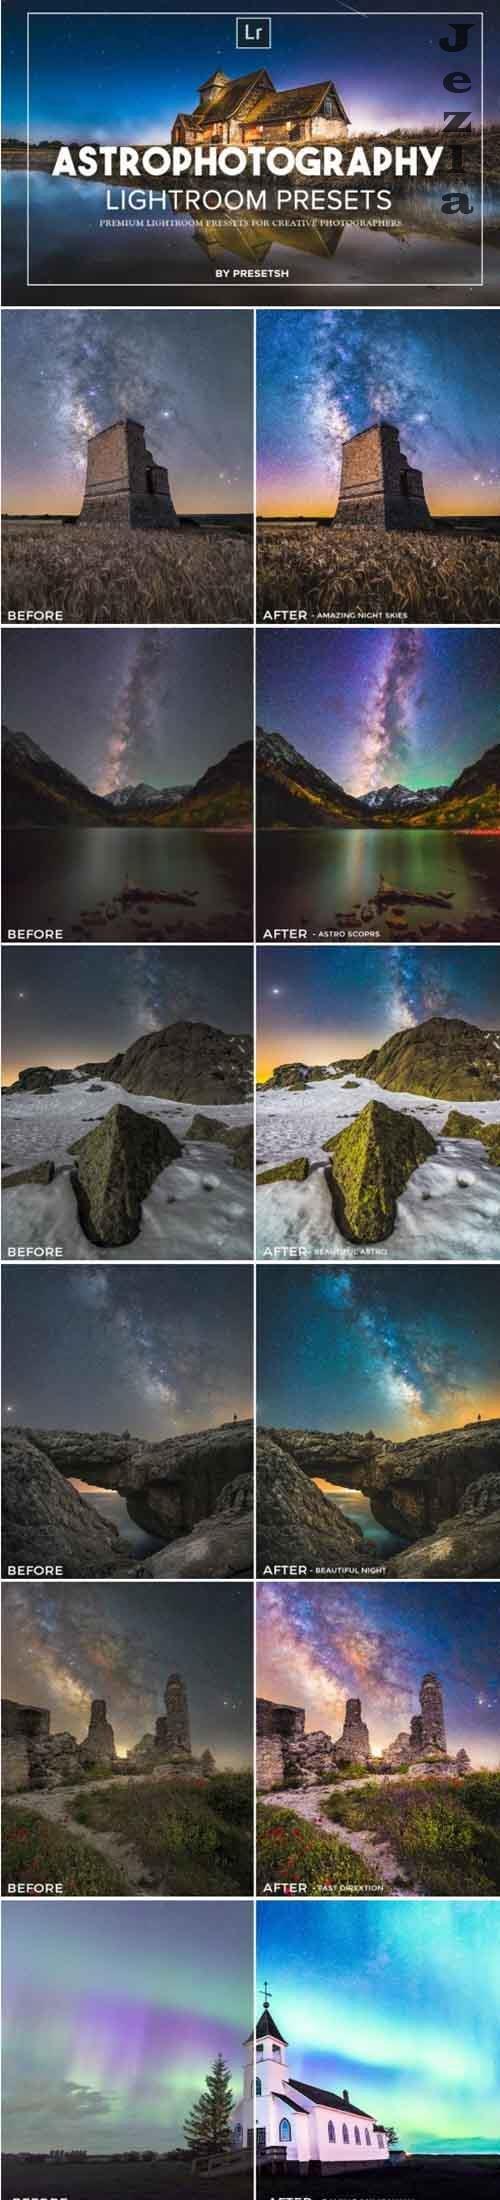 Astro Photography Lightroom Presets 4843397